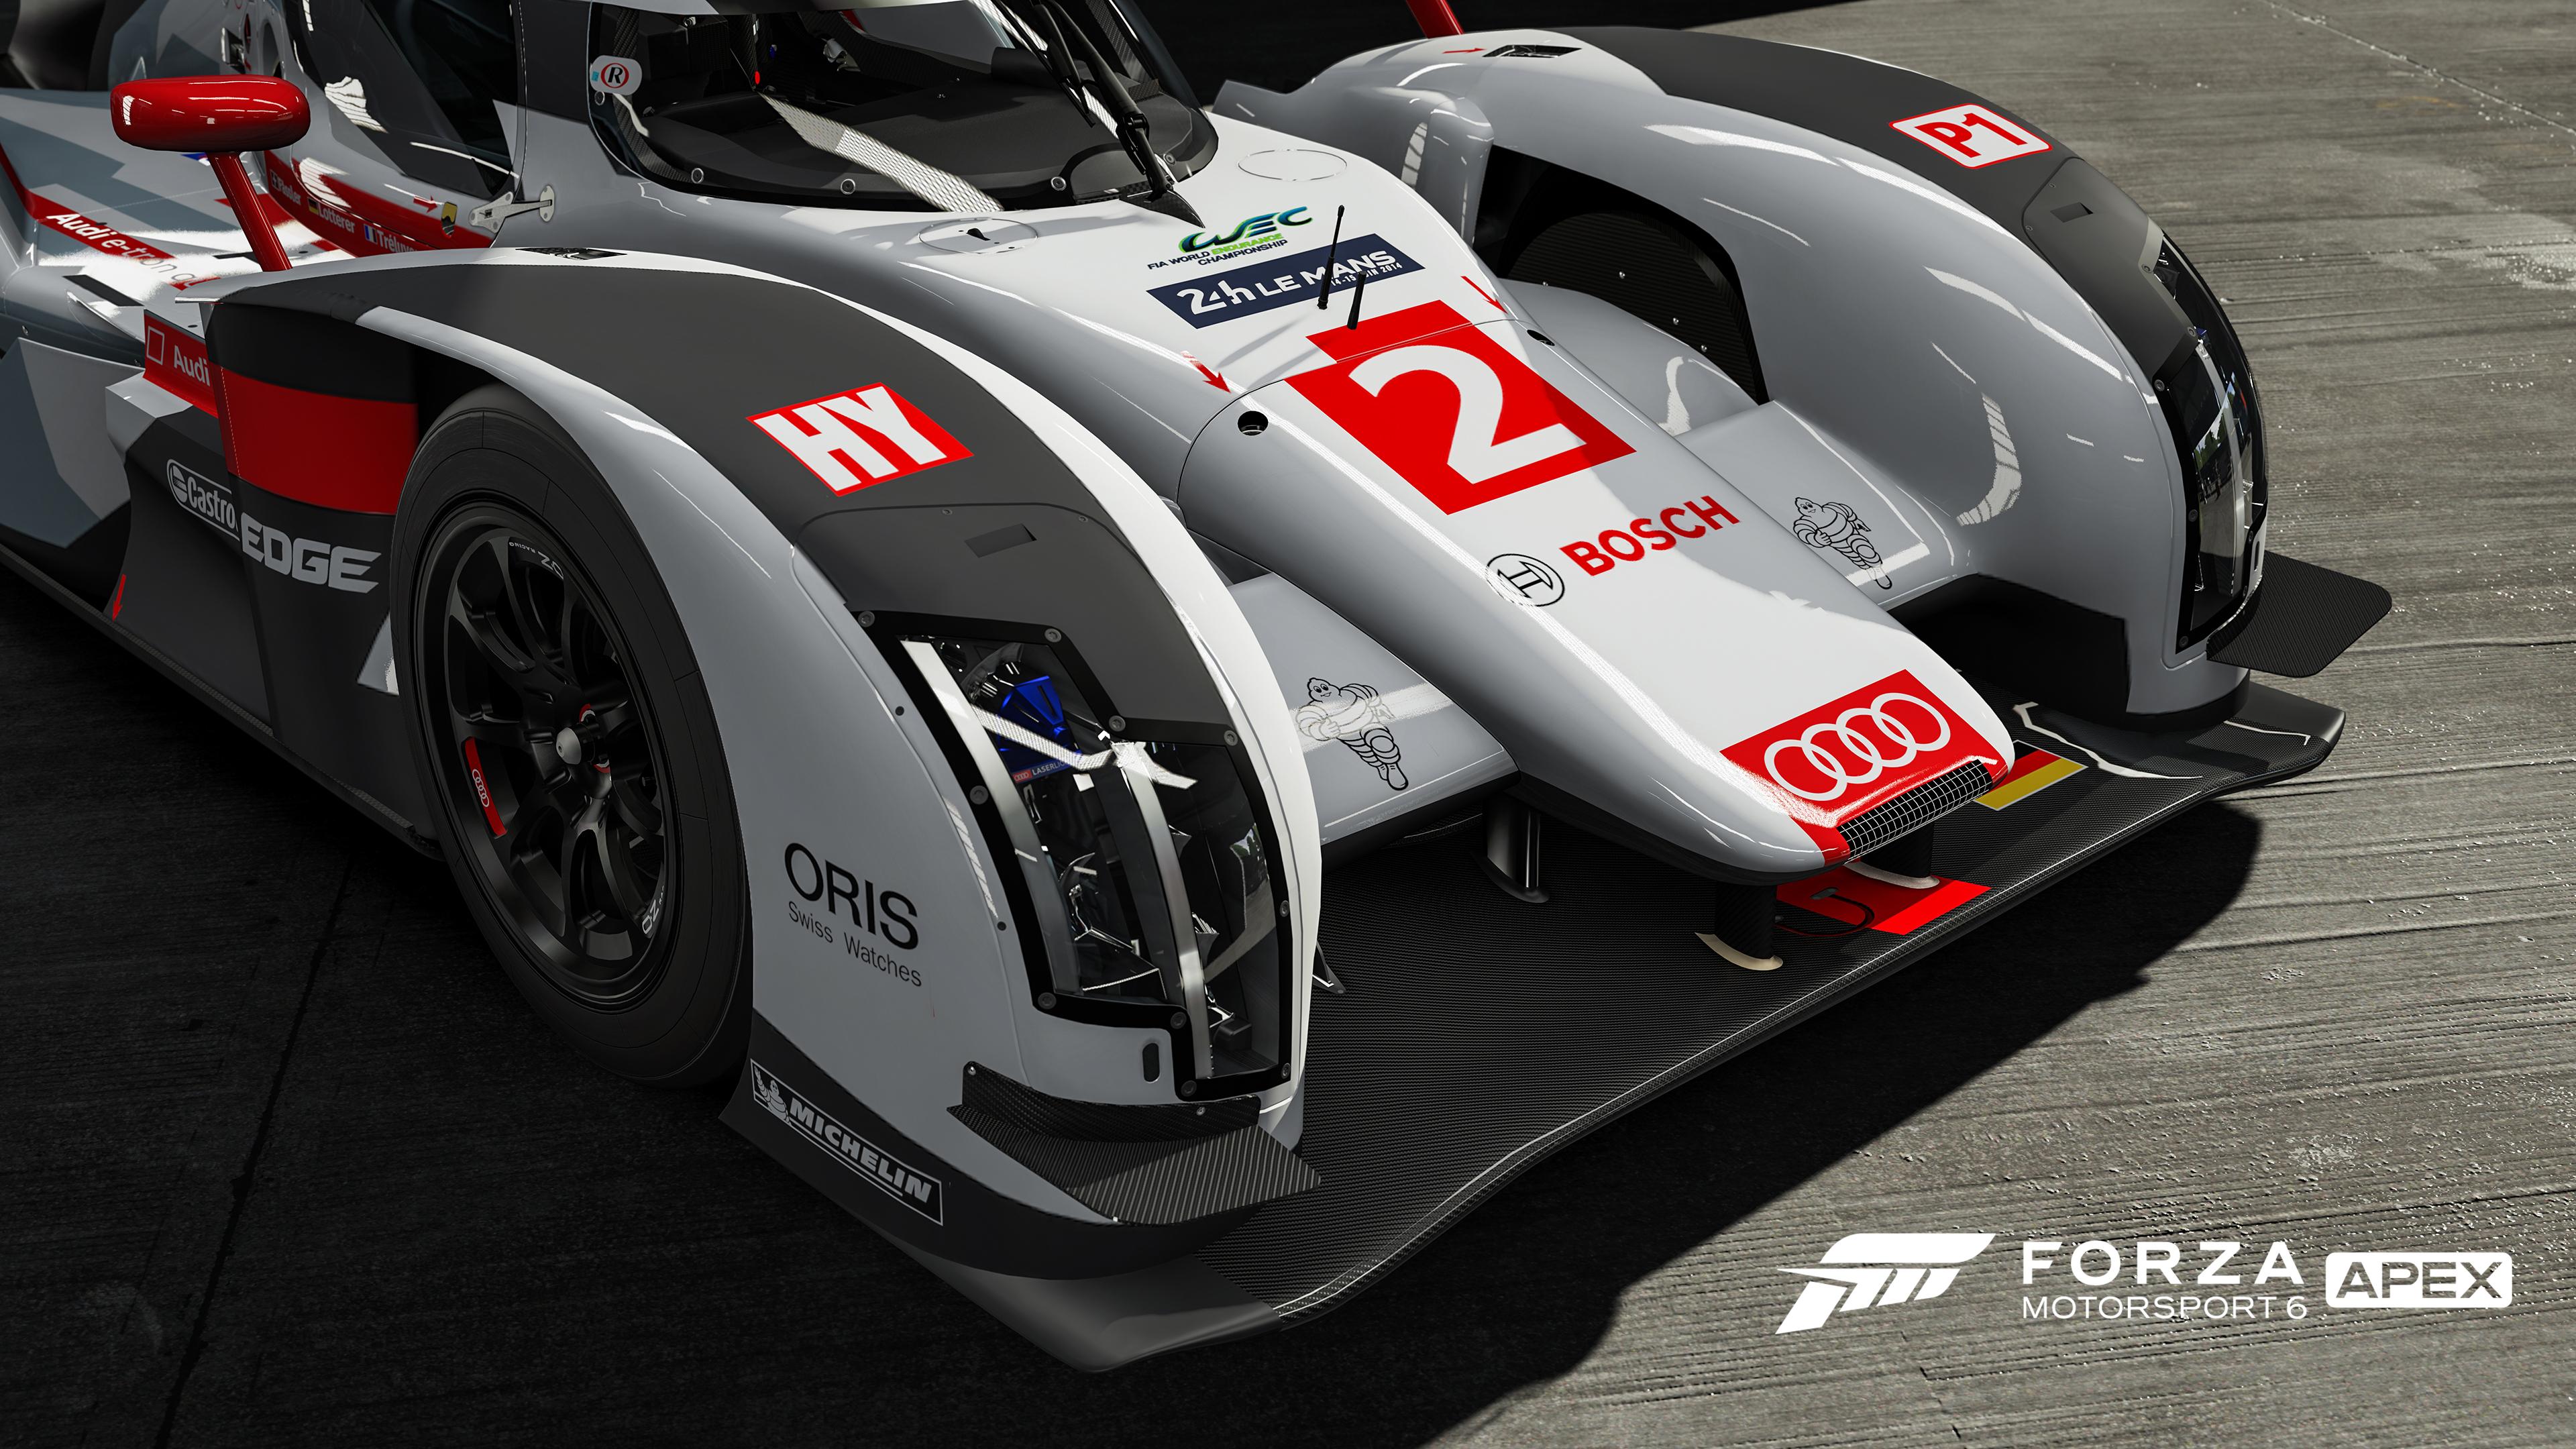 Forza Motorsport 6 :Apex